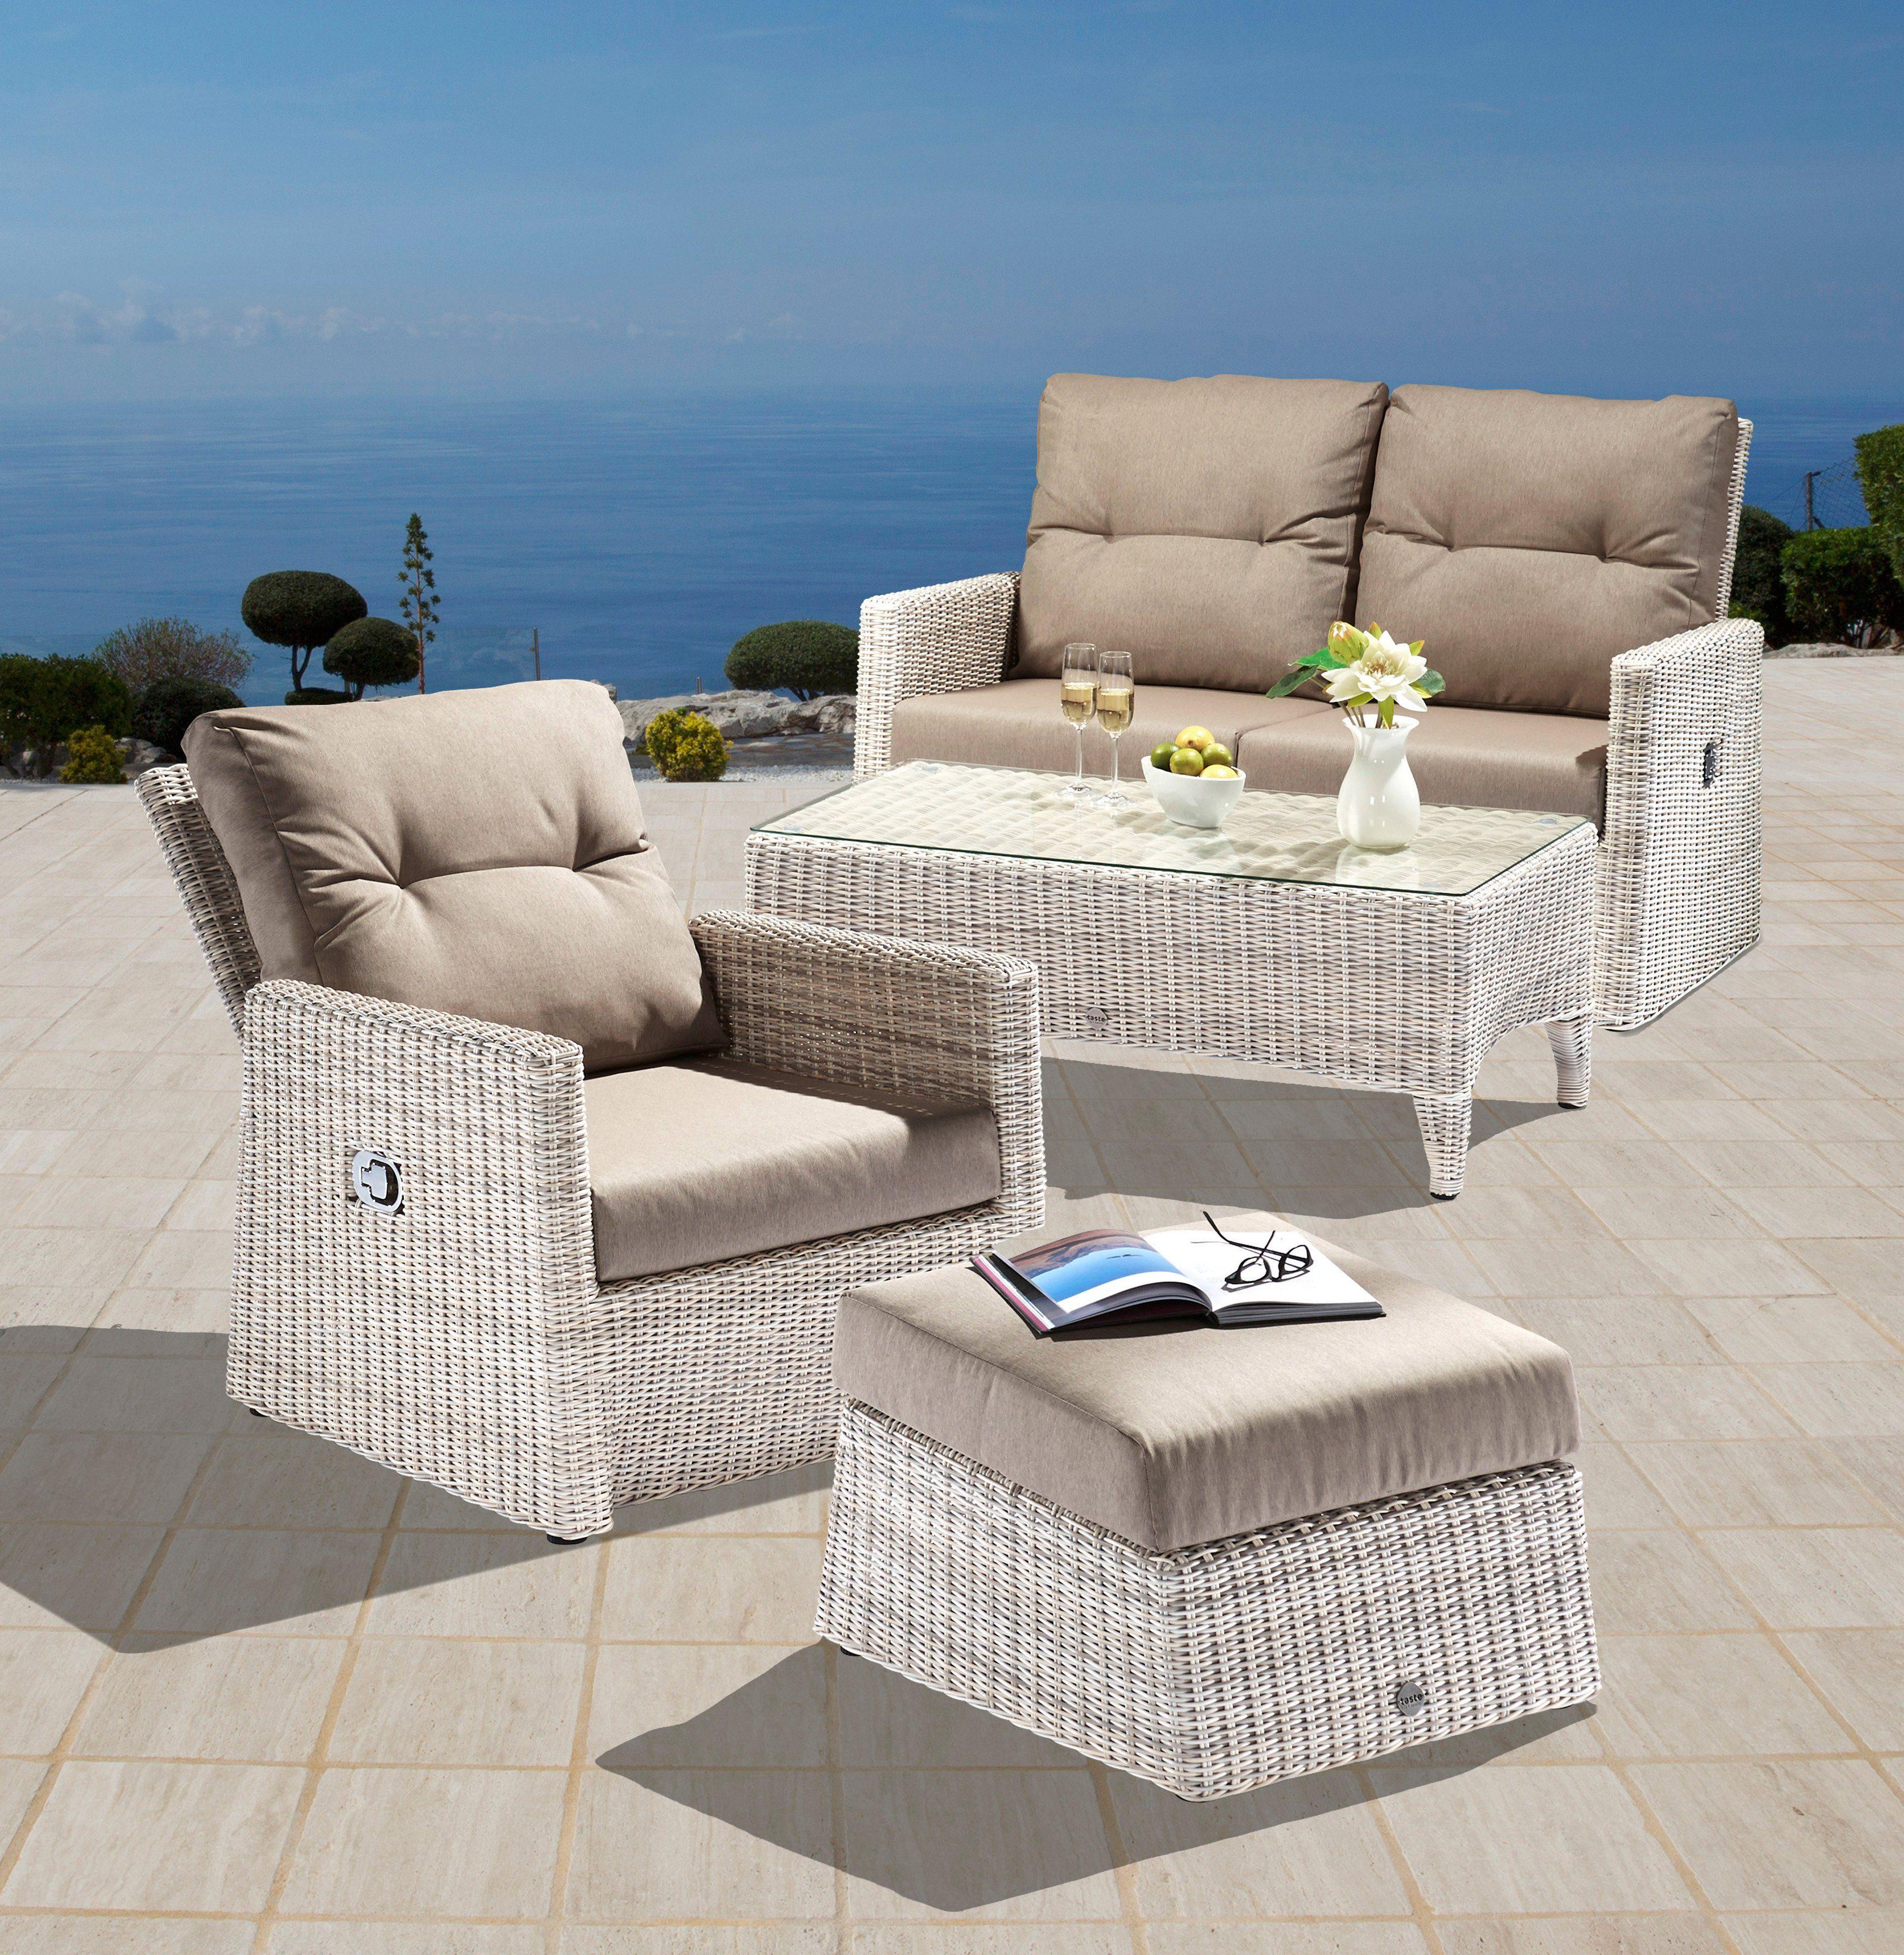 11-tgl. Loungeset »Catania«, 2er Sofa, Sessel, Hocker, Tisch 110x60 cm, Polyrattan, altweiß